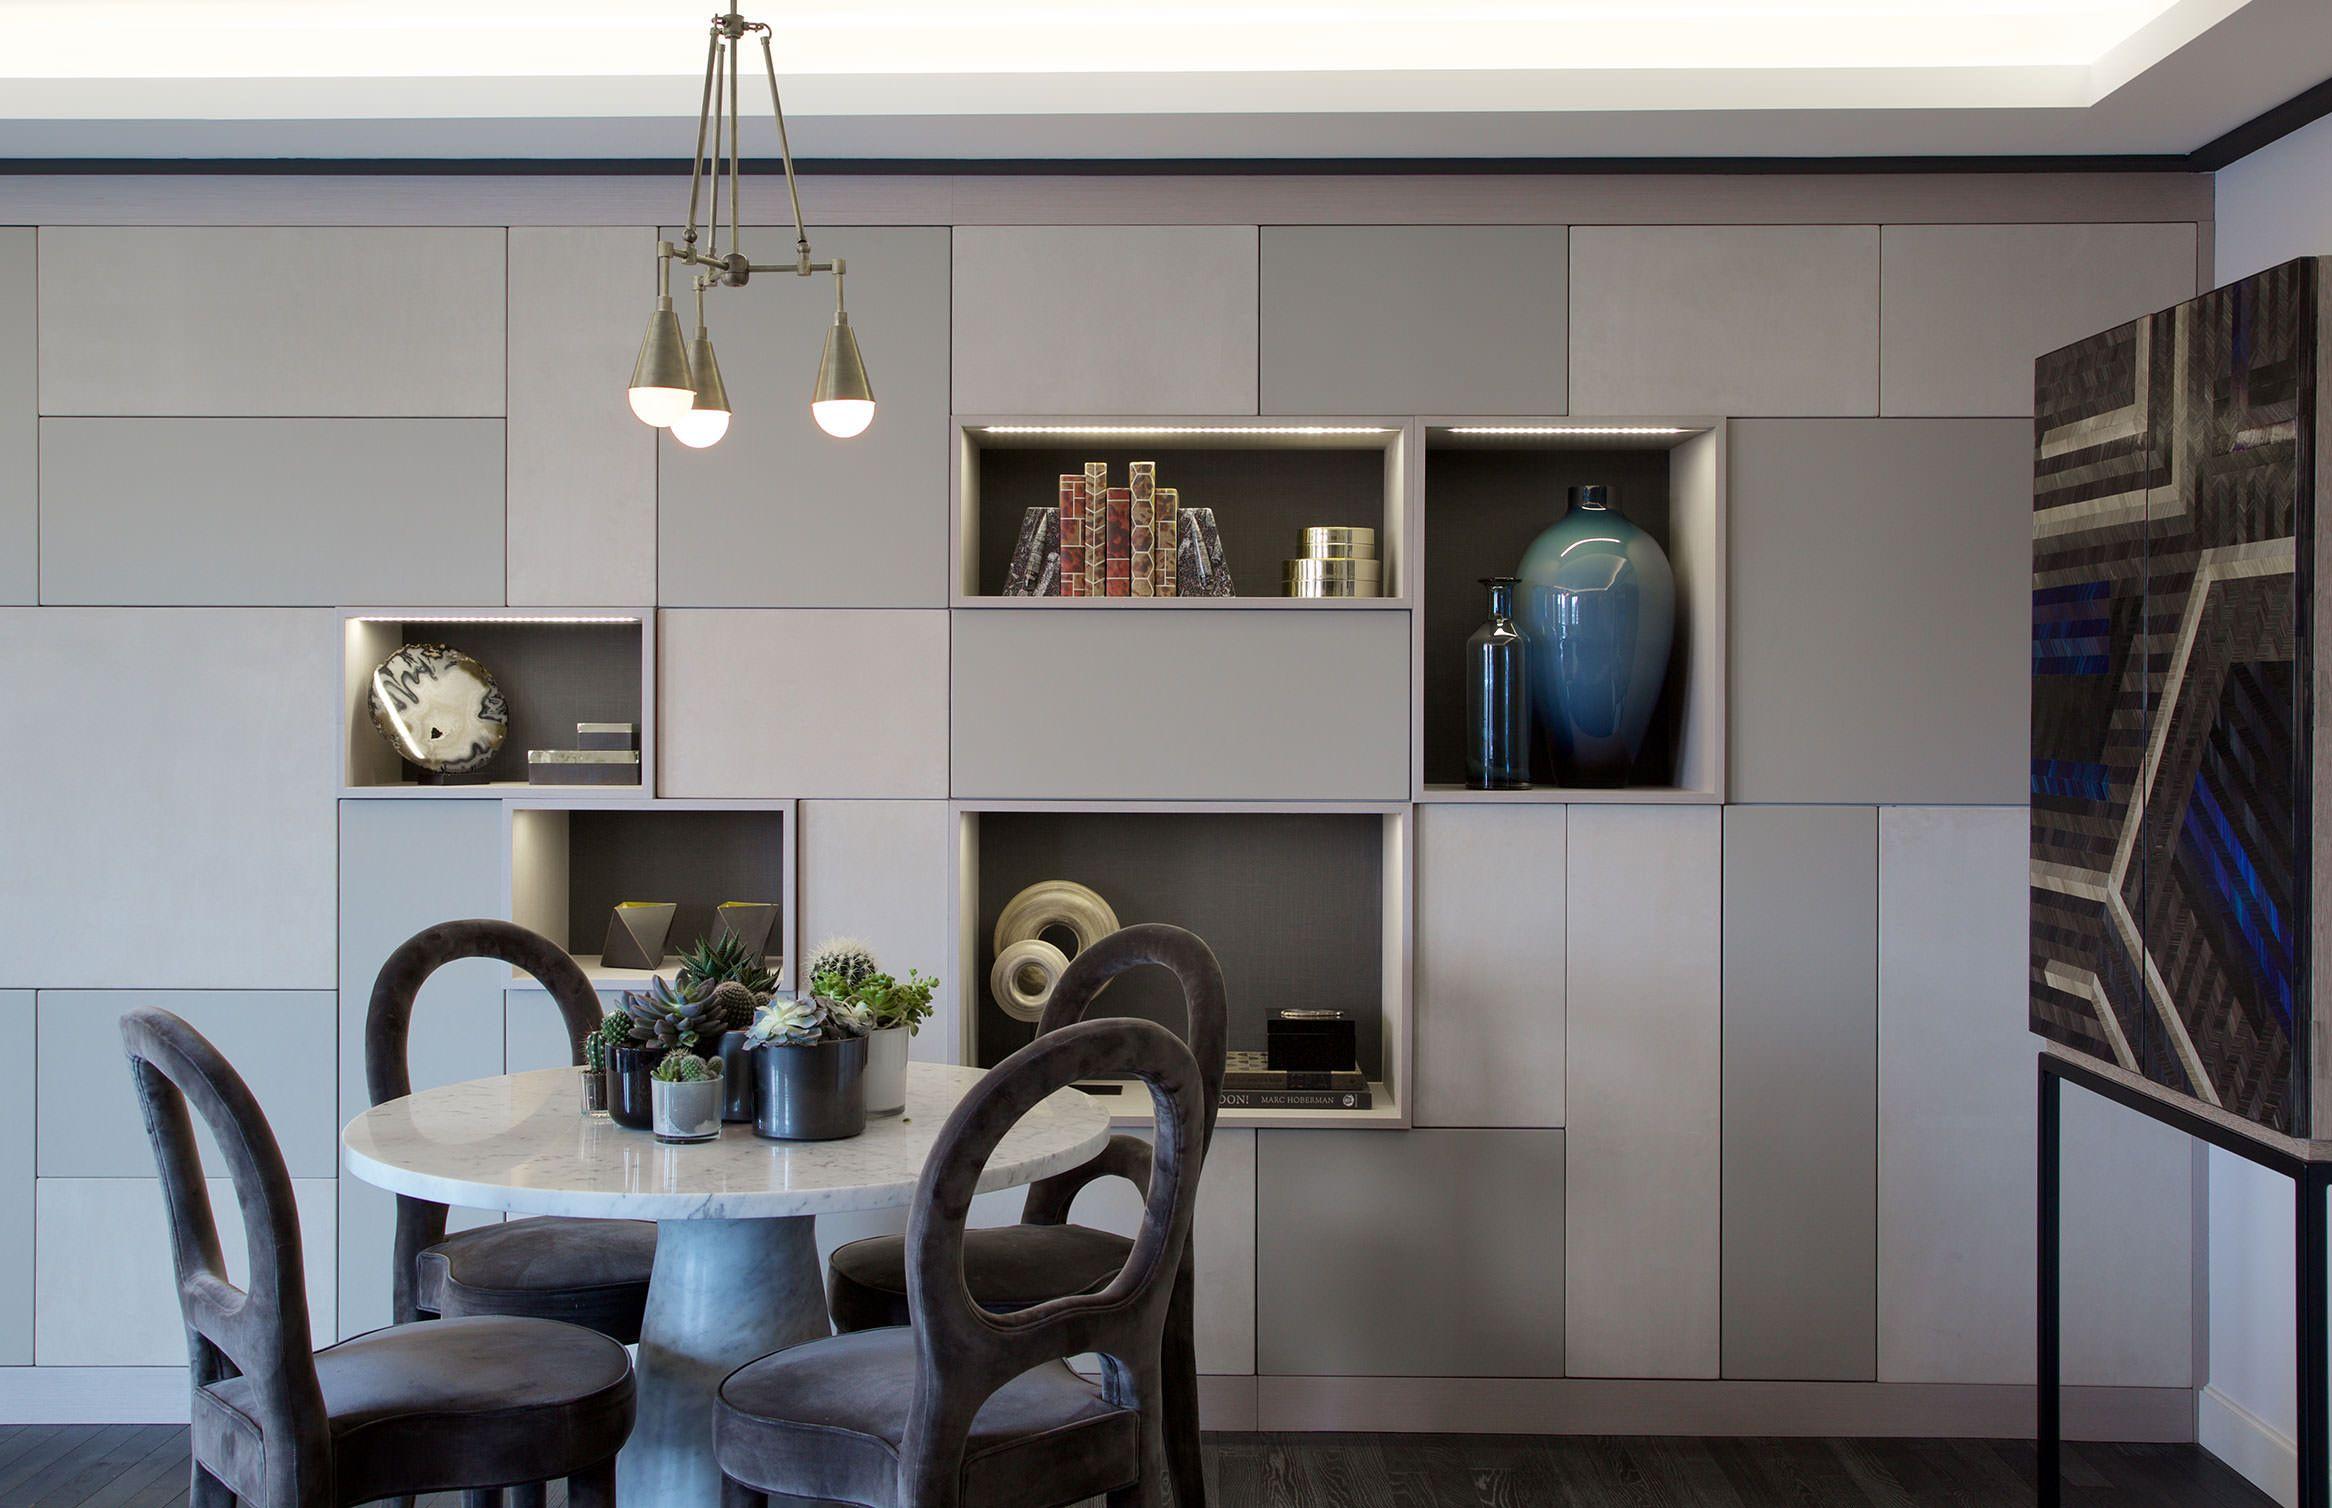 Riverside Apartment Kitchen Lawson Robb www.lawsonrobb